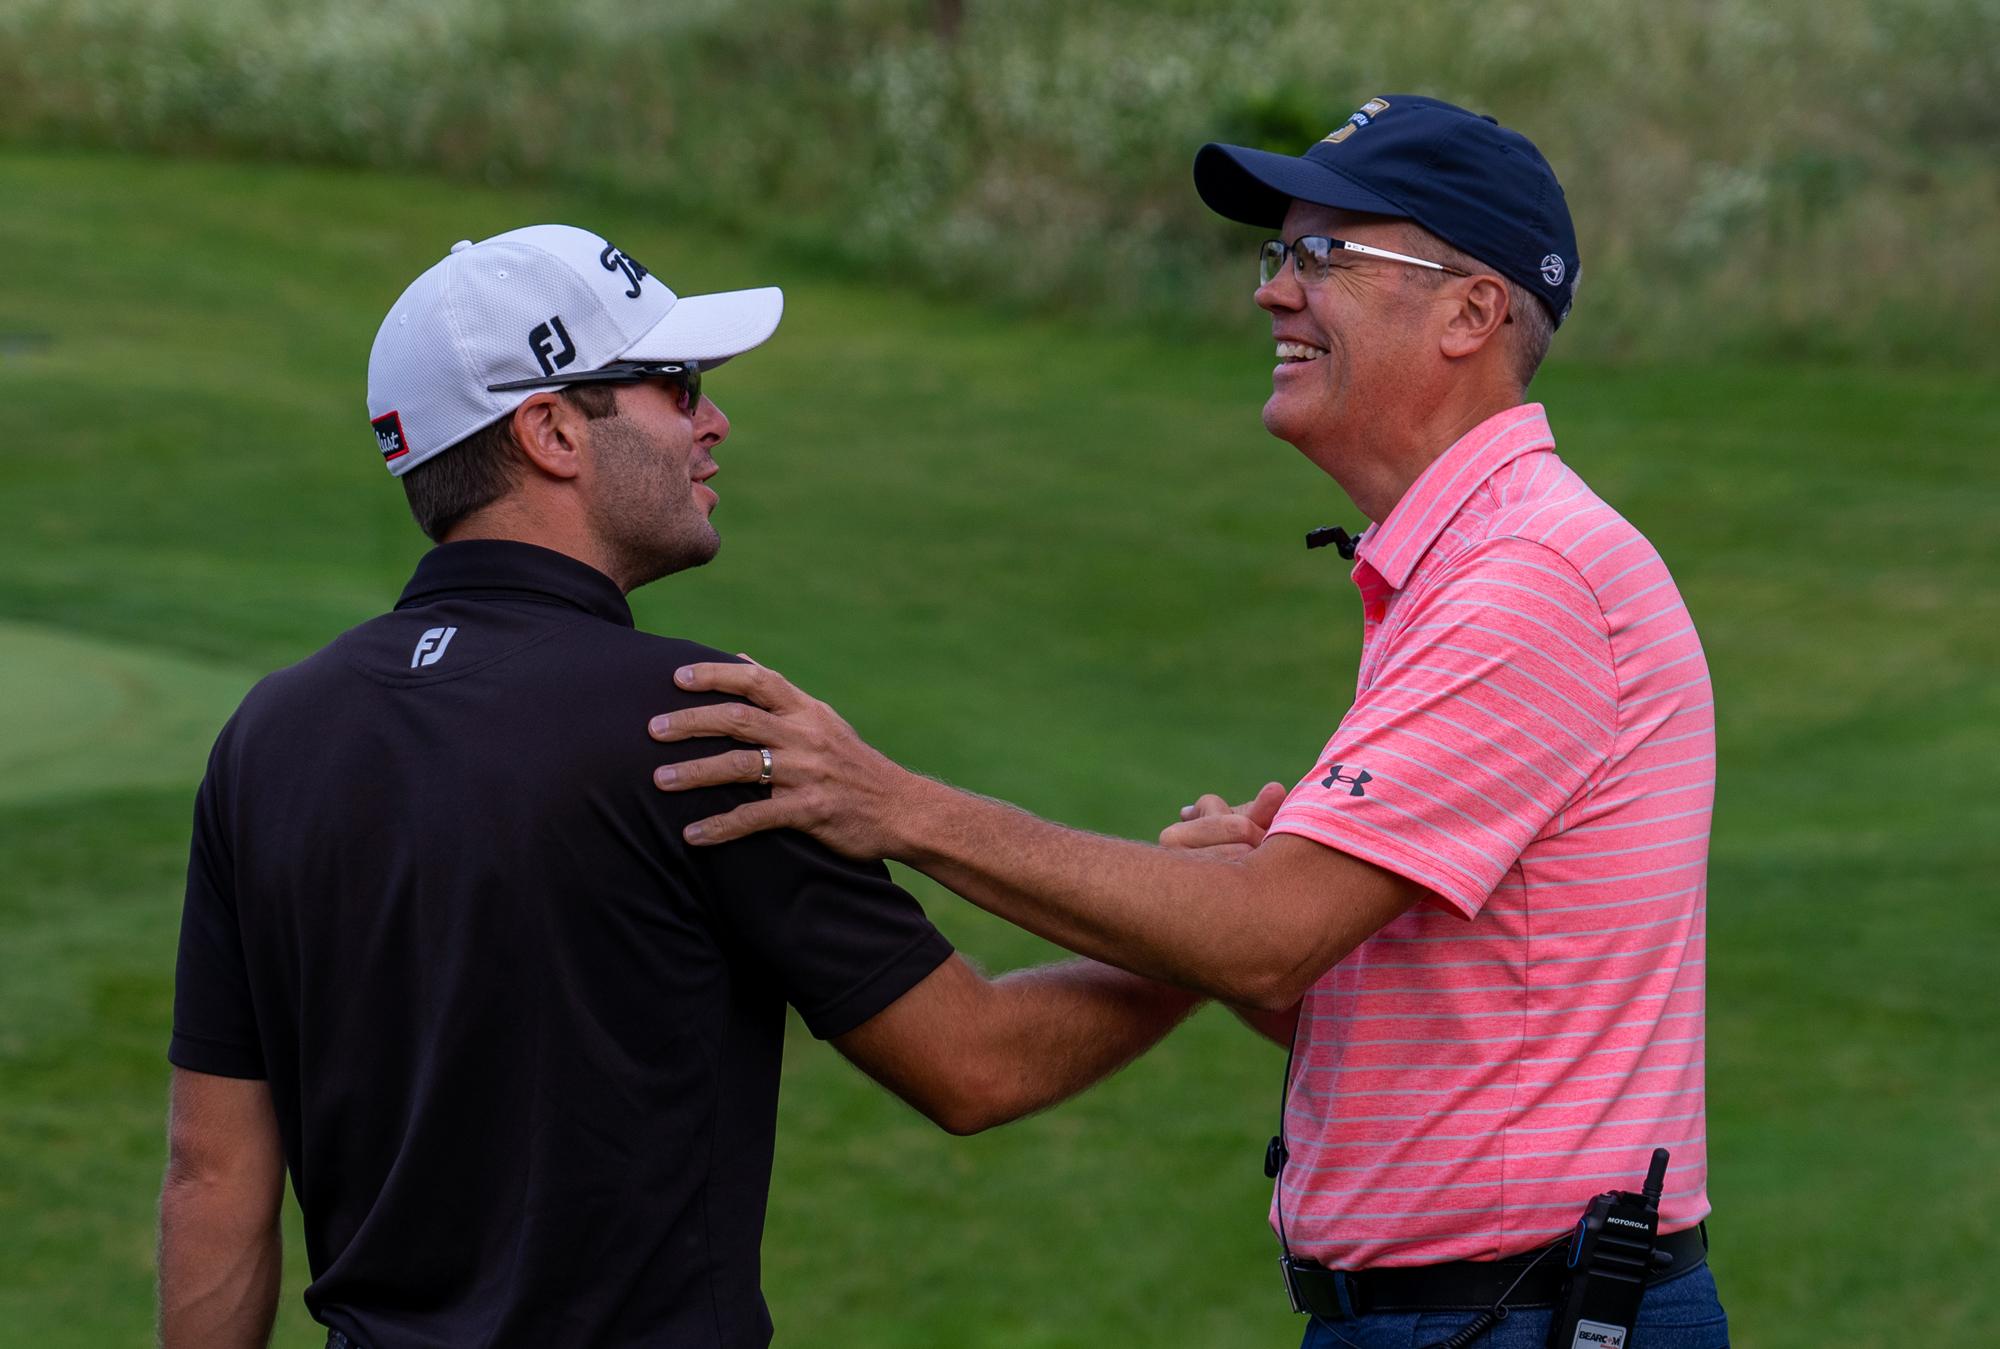 Joe Stalder and Dan Woltman Congrats